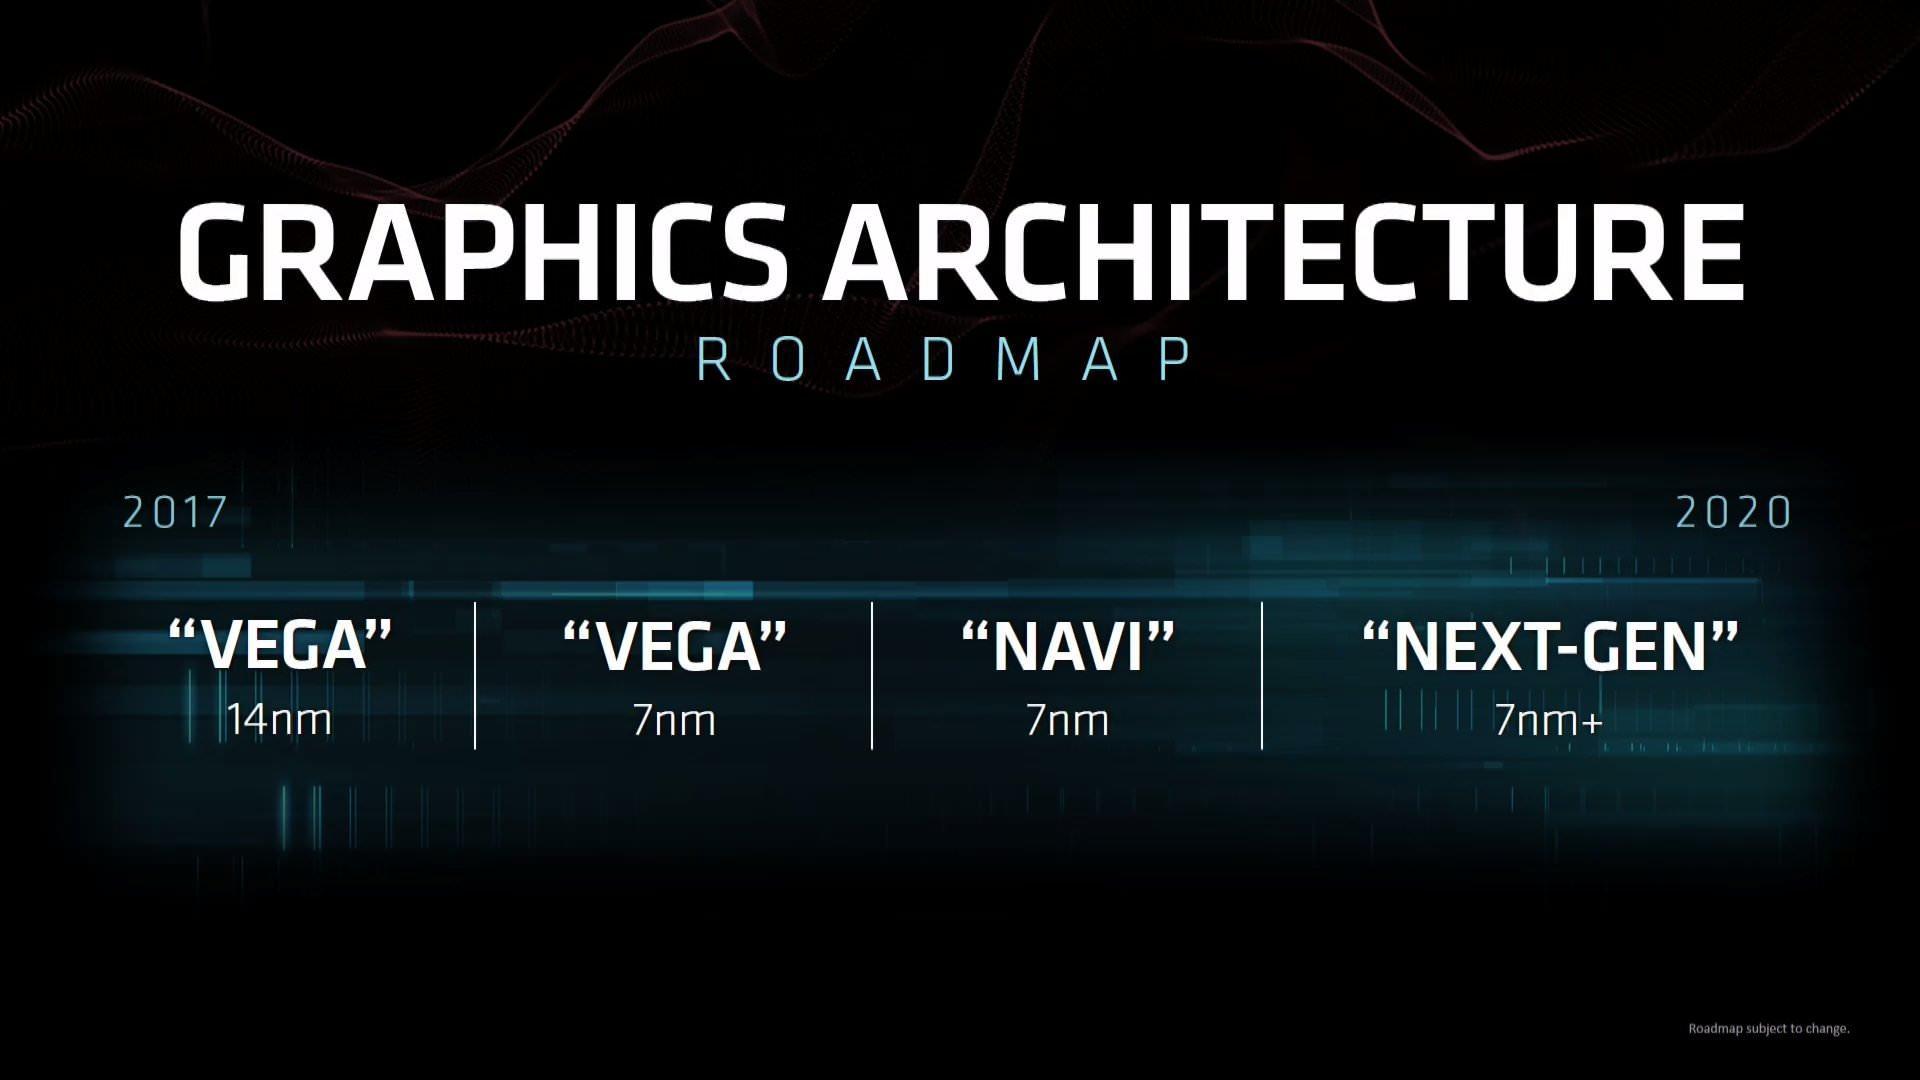 AMD Radeon Roadmap 2